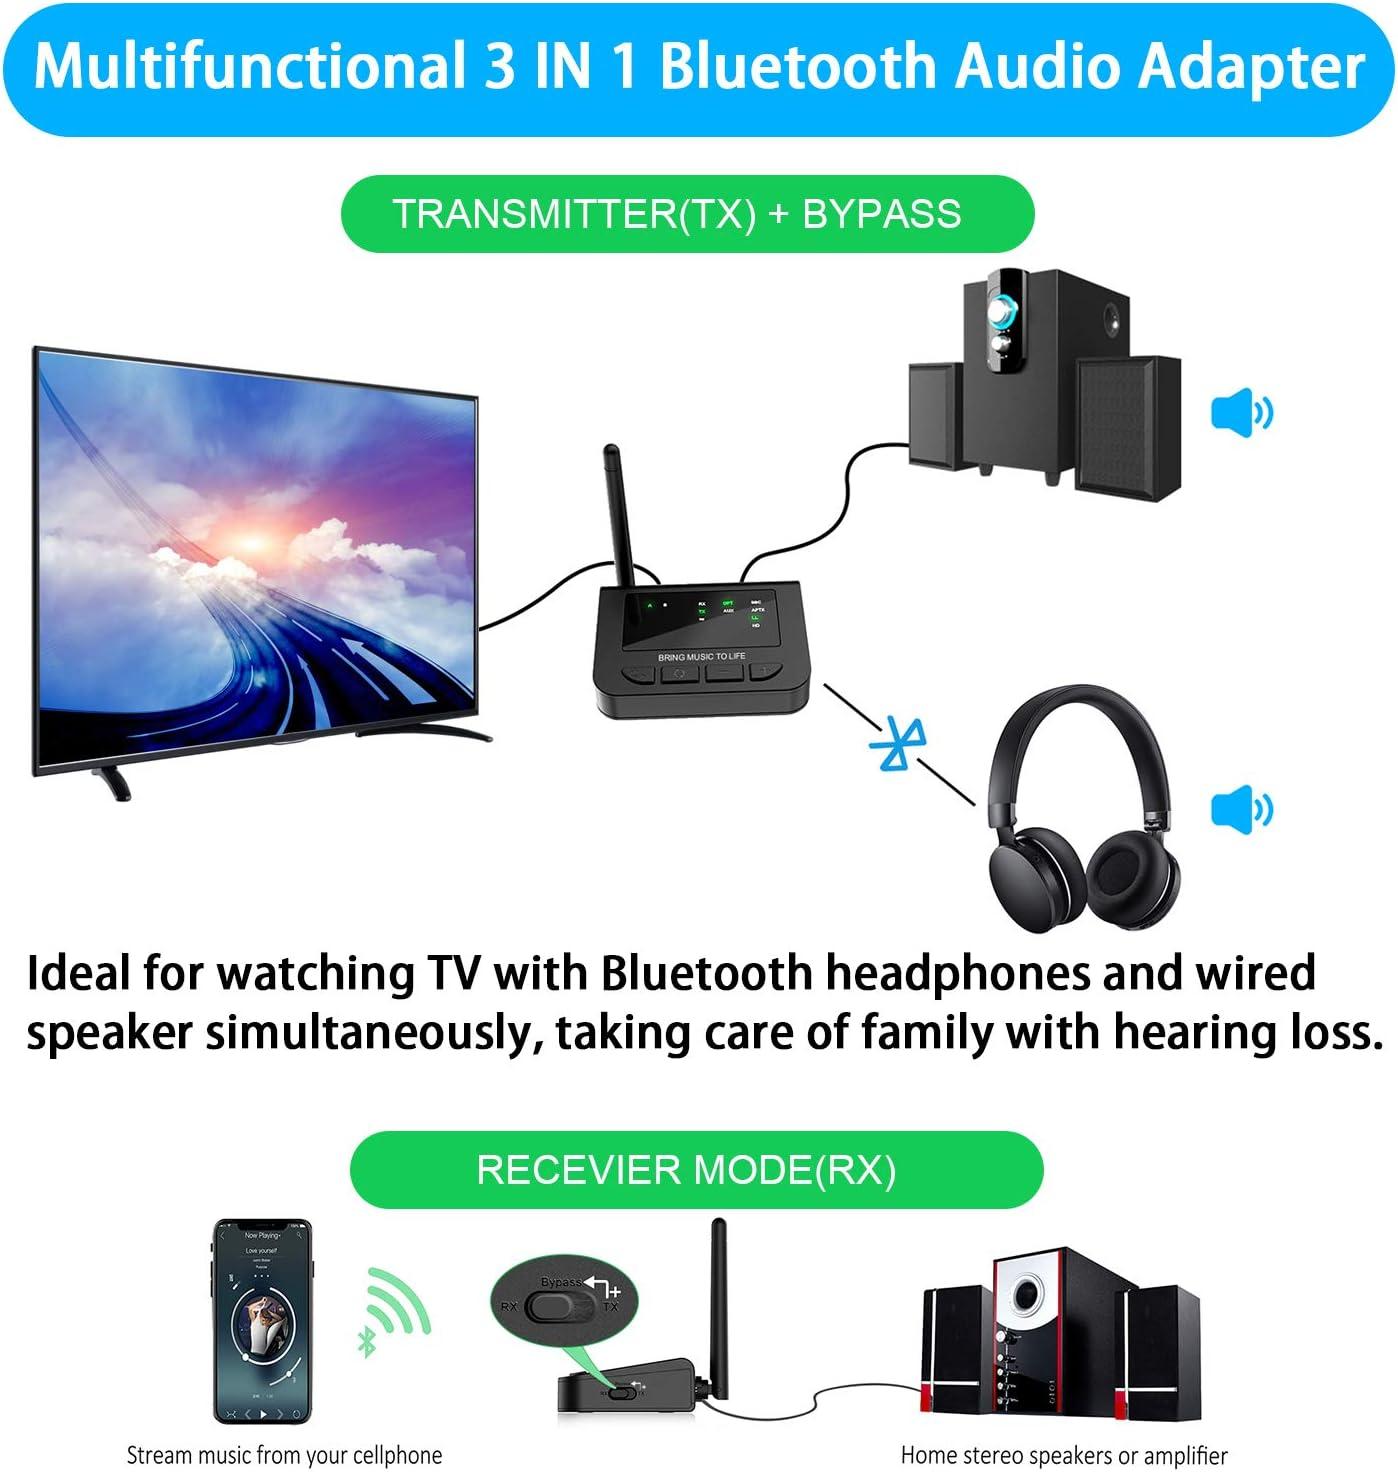 iPod genie/ßen Sie HiFi Musik Streaming PC Golvery Bluetooth 5.0 Transmitter Receiver mit aptX Low Latency Dual Link Wireless Audio Adapter f/ür Heimkino TV Home Stereo /über 3,5 mm //RCA AUX Jack